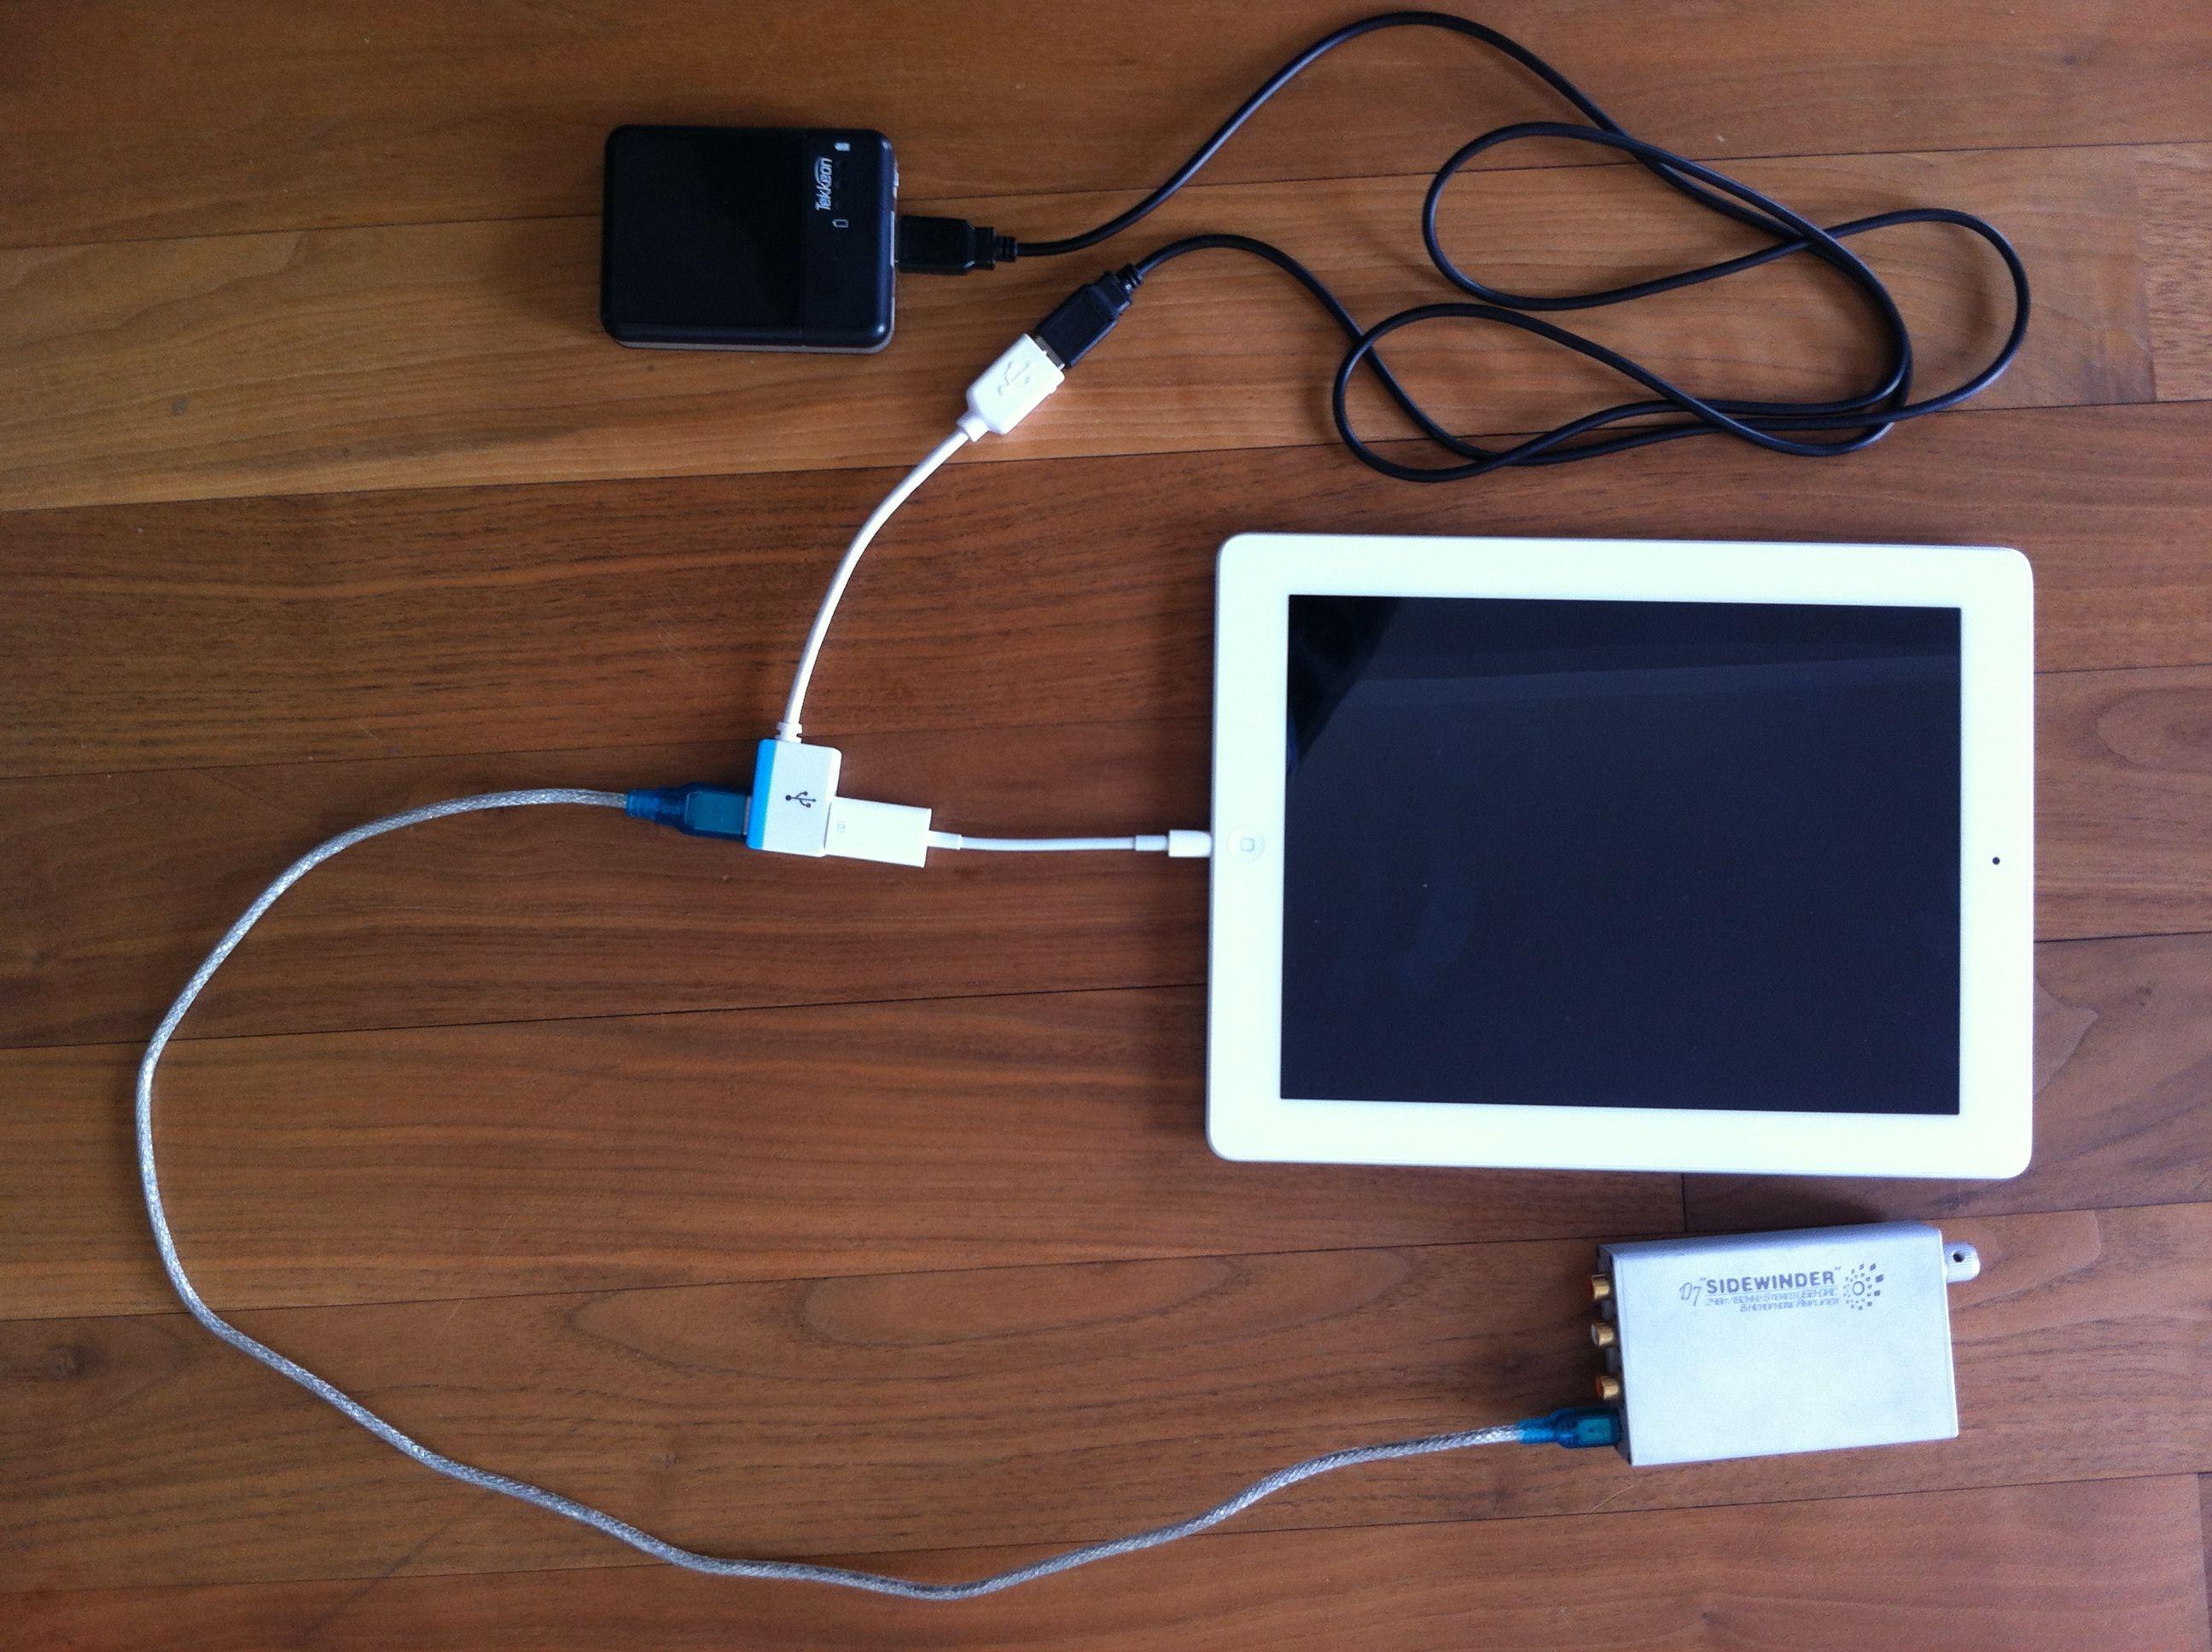 iPad iPhone bit-perfect DLNA/UPnP wi-fi streaming 24bit or